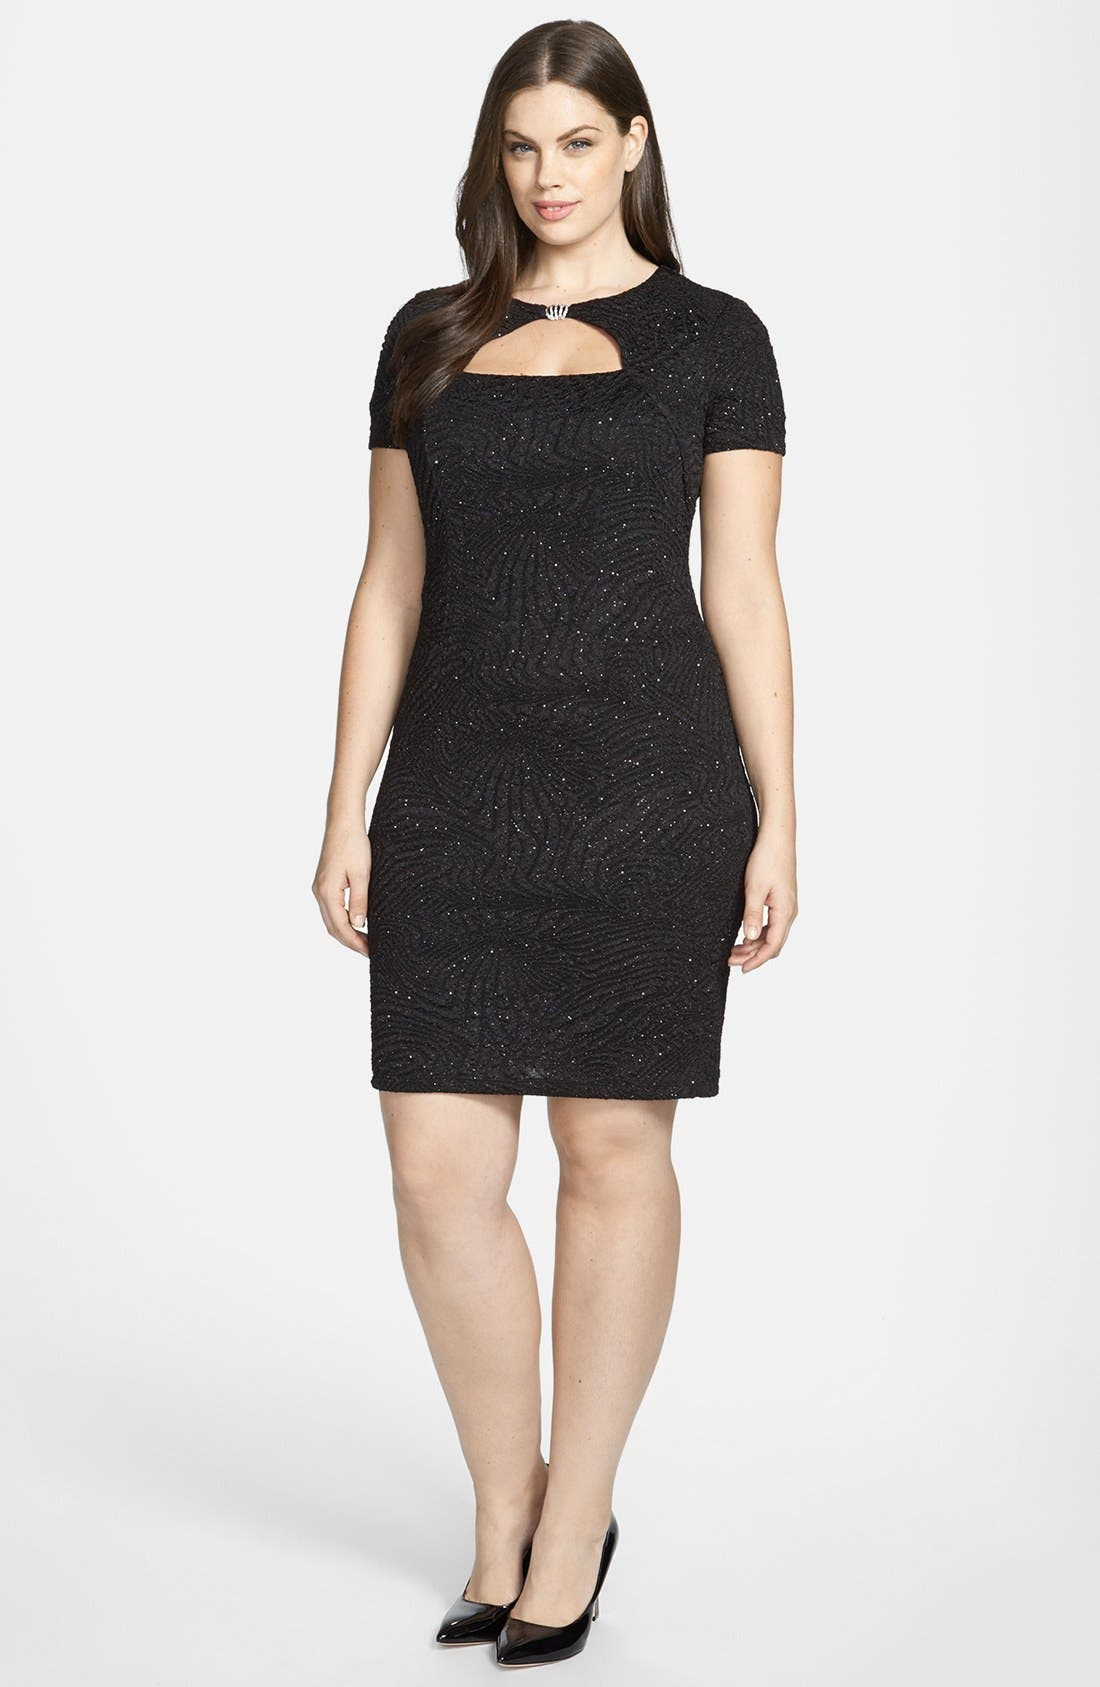 Alternate Image 1 Selected - London Times Embellished Sparkle Plissé Sheath Dress (Plus Size)